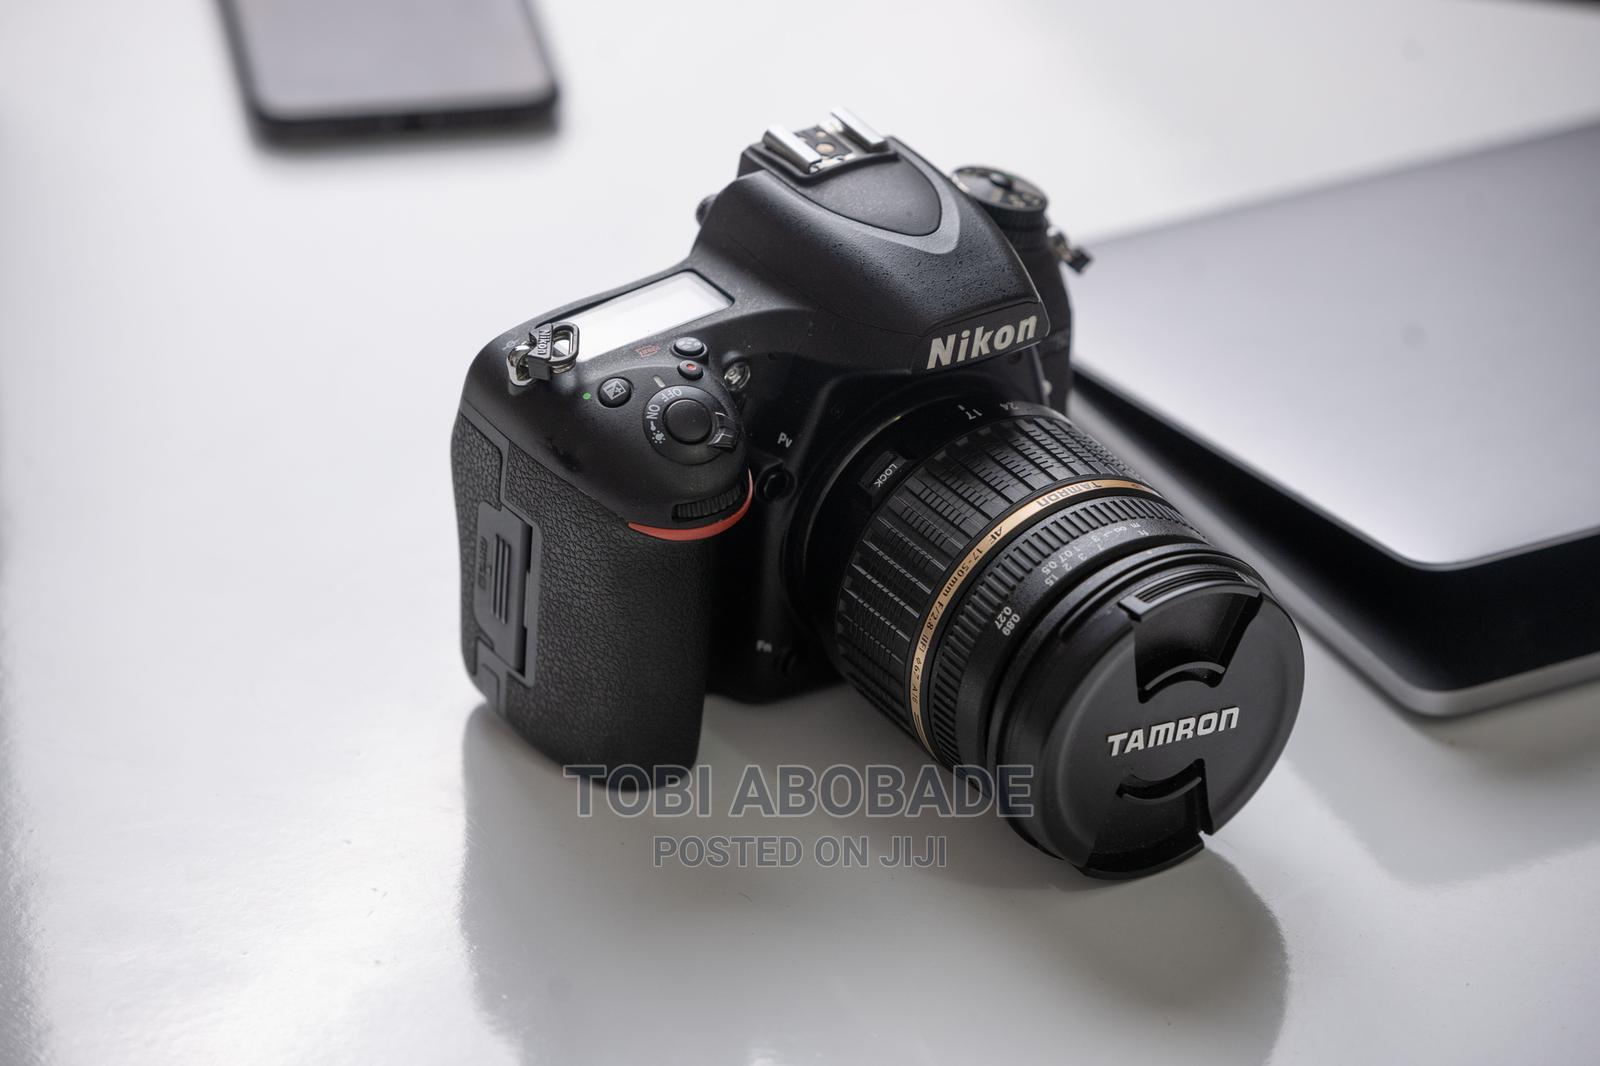 Archive: Open Box Nikon D750 + Full Accessories + Tamron 17-50mm 2.8